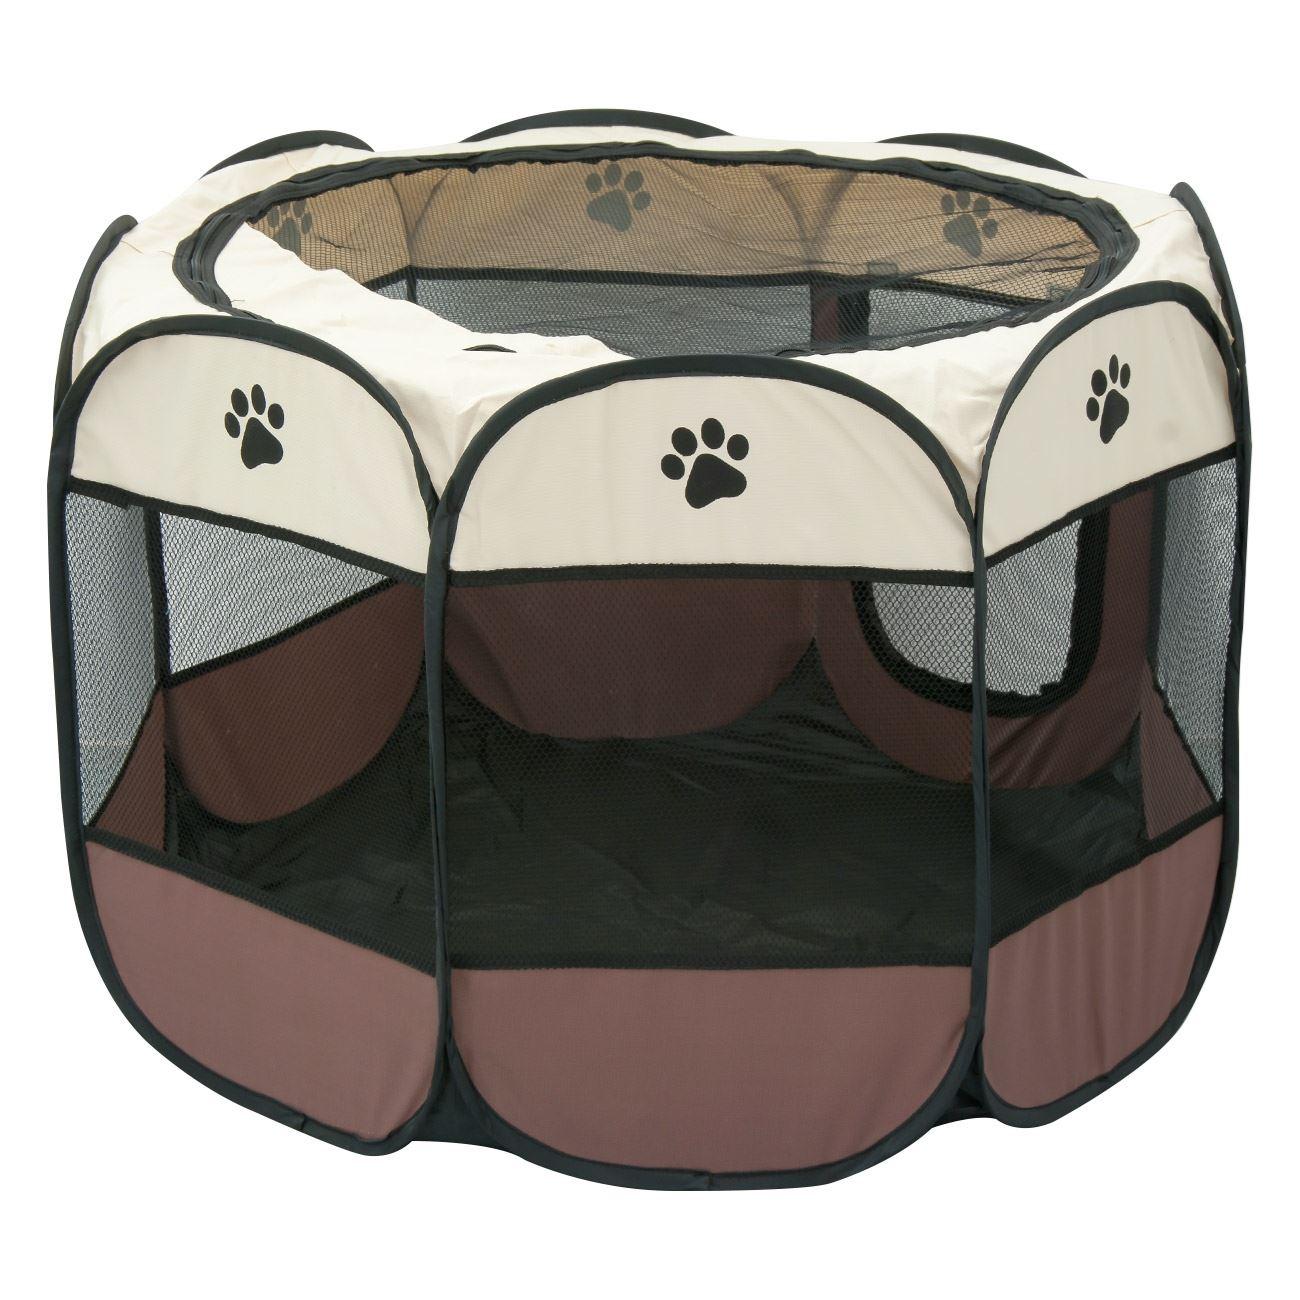 5cdb30d40a84 Πάρκο Σκύλου Καφέ Μπεζ 91x91x58   Περιορισμός Κατοικιδίων